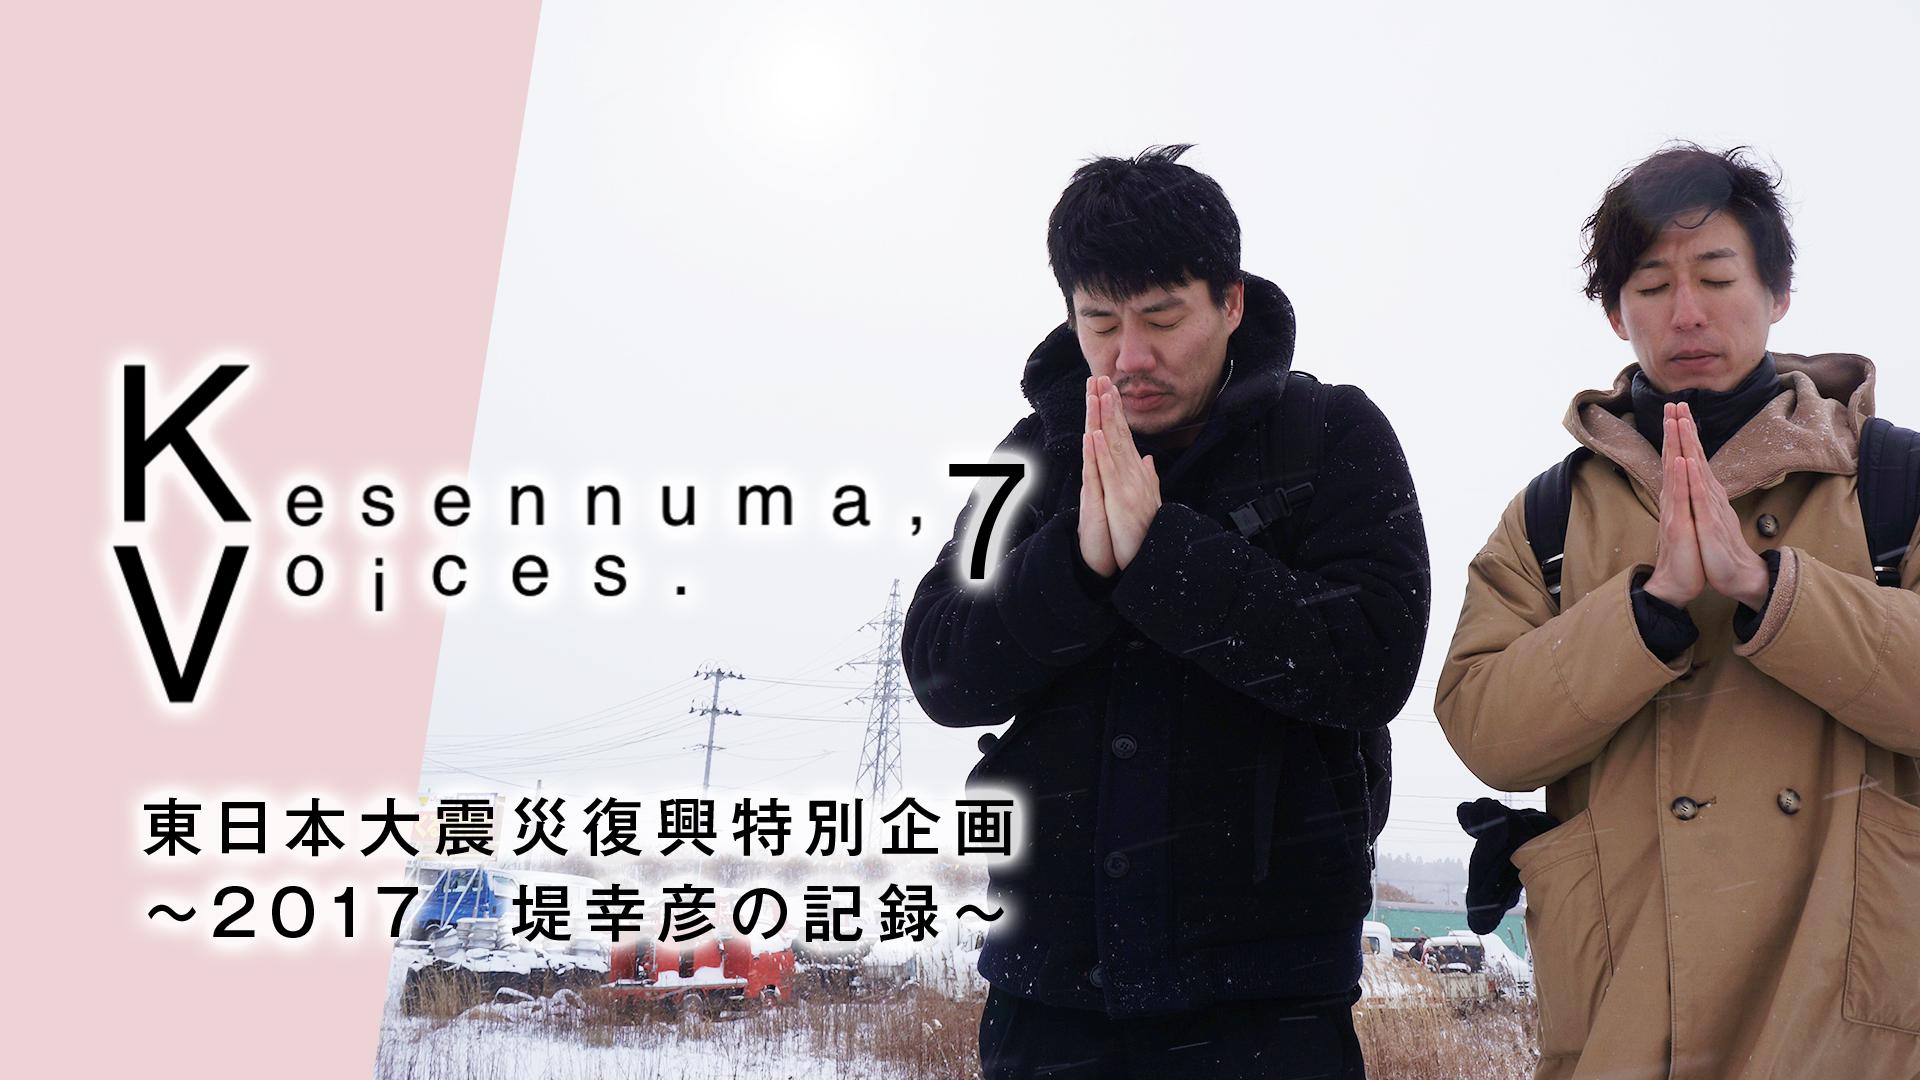 Kesennuma,Voices.7 東日本大震災復興特別企画~2017 堤幸彦の記録~ 動画